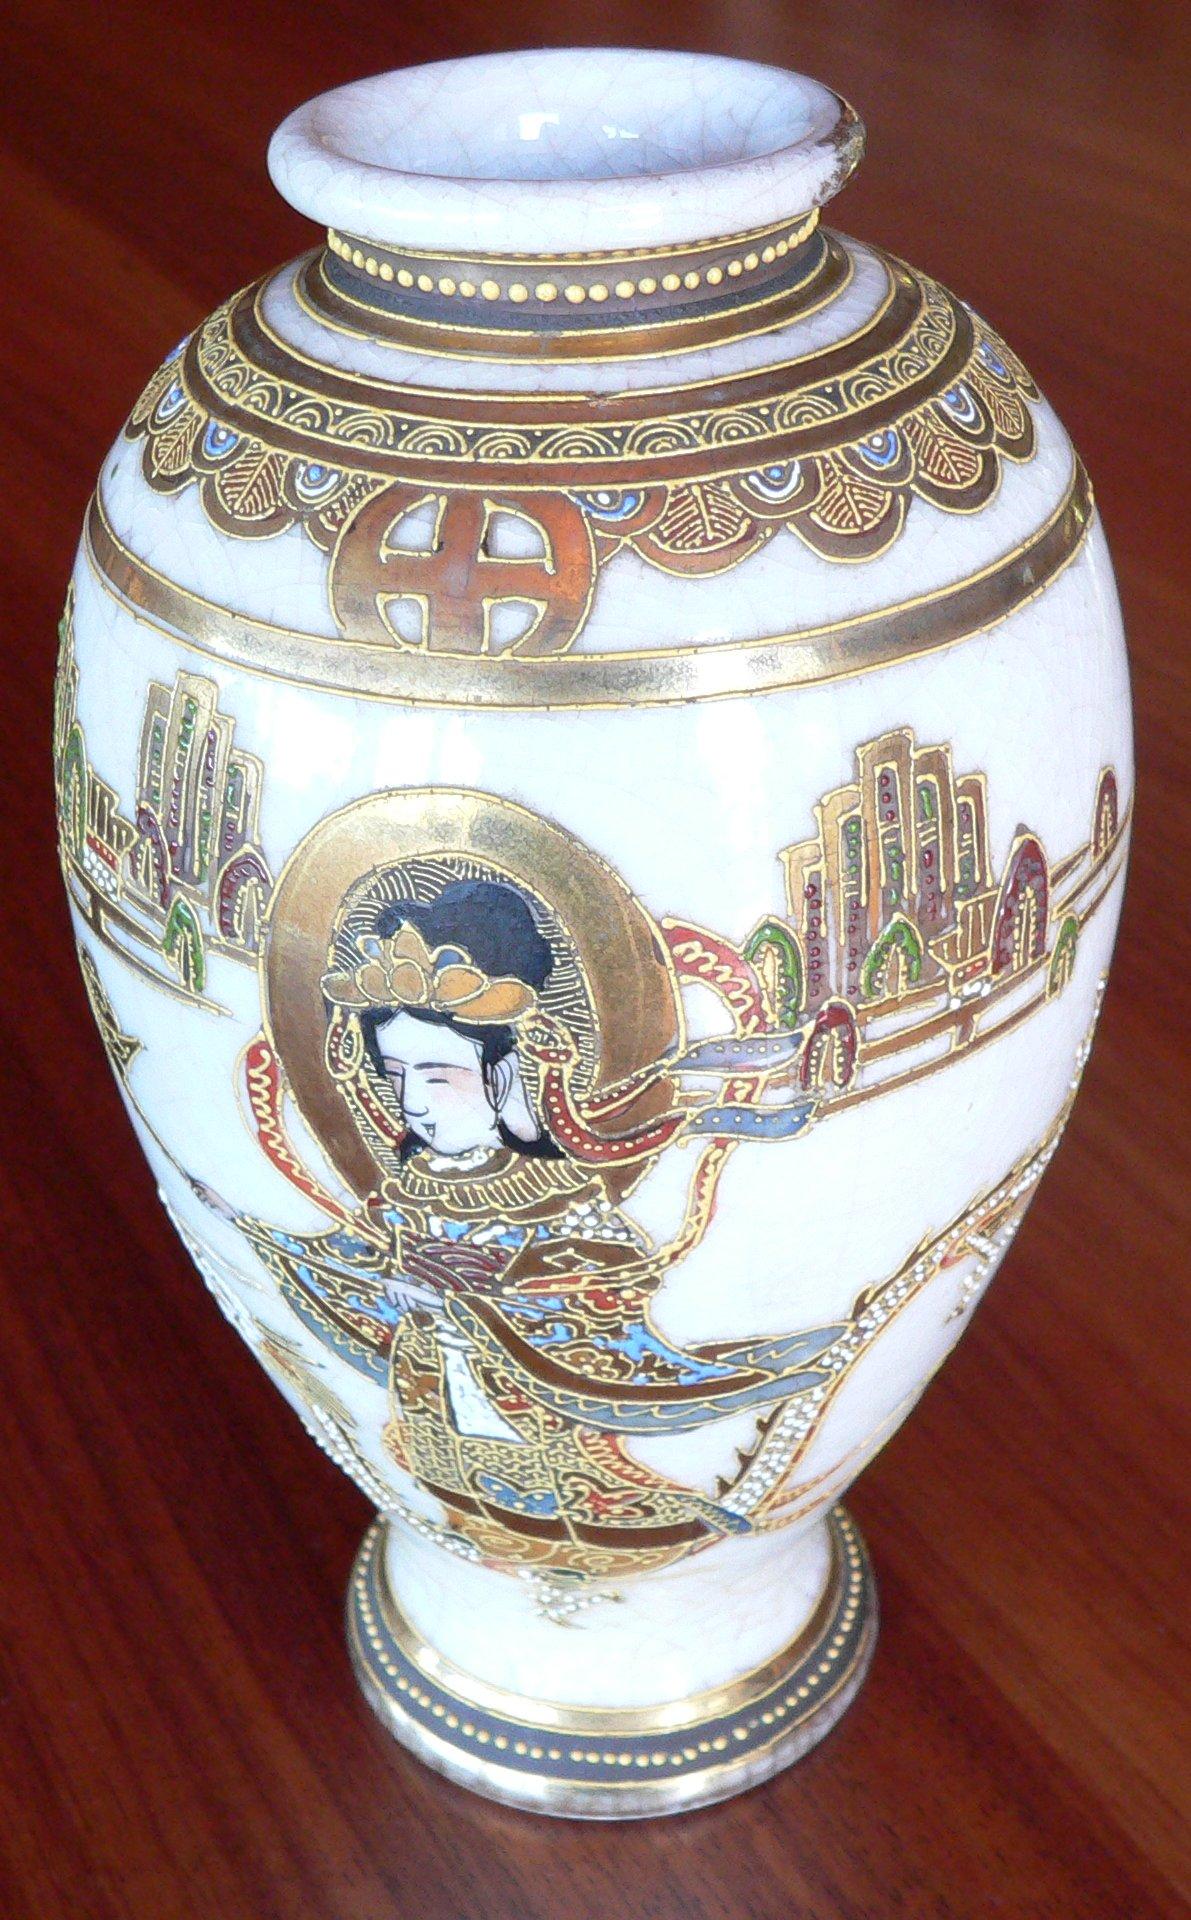 Satsuma vase signatures image collections vases design picture help identify oriental vase satsuma pottery grass script vase reviewsmspy reviewsmspy